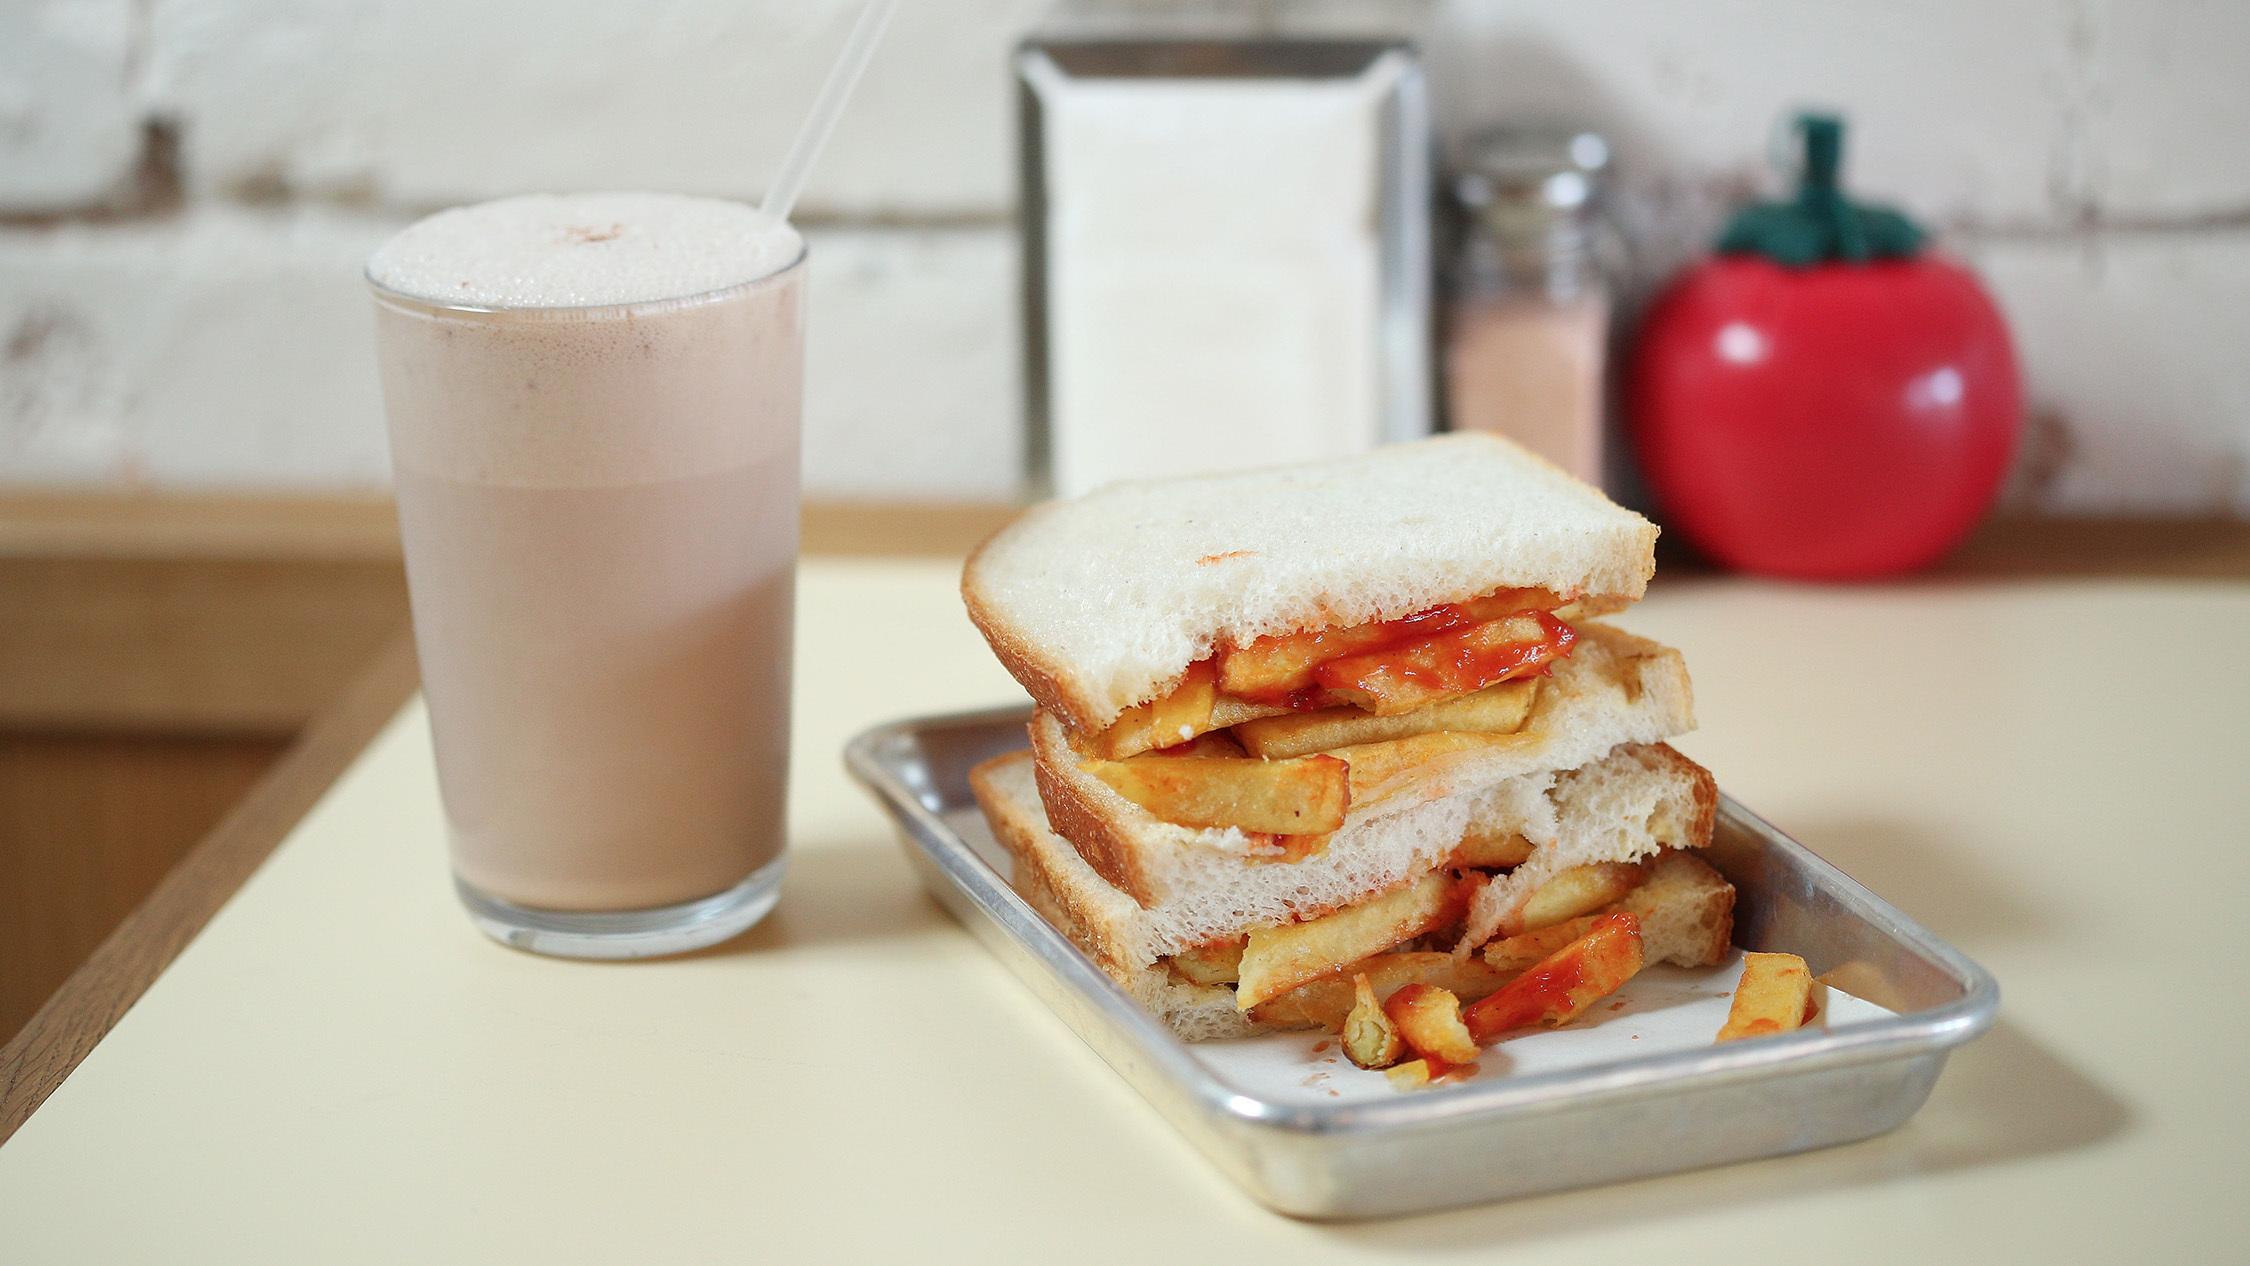 Chip sandwich at Kelso's Sandwich Shoppe